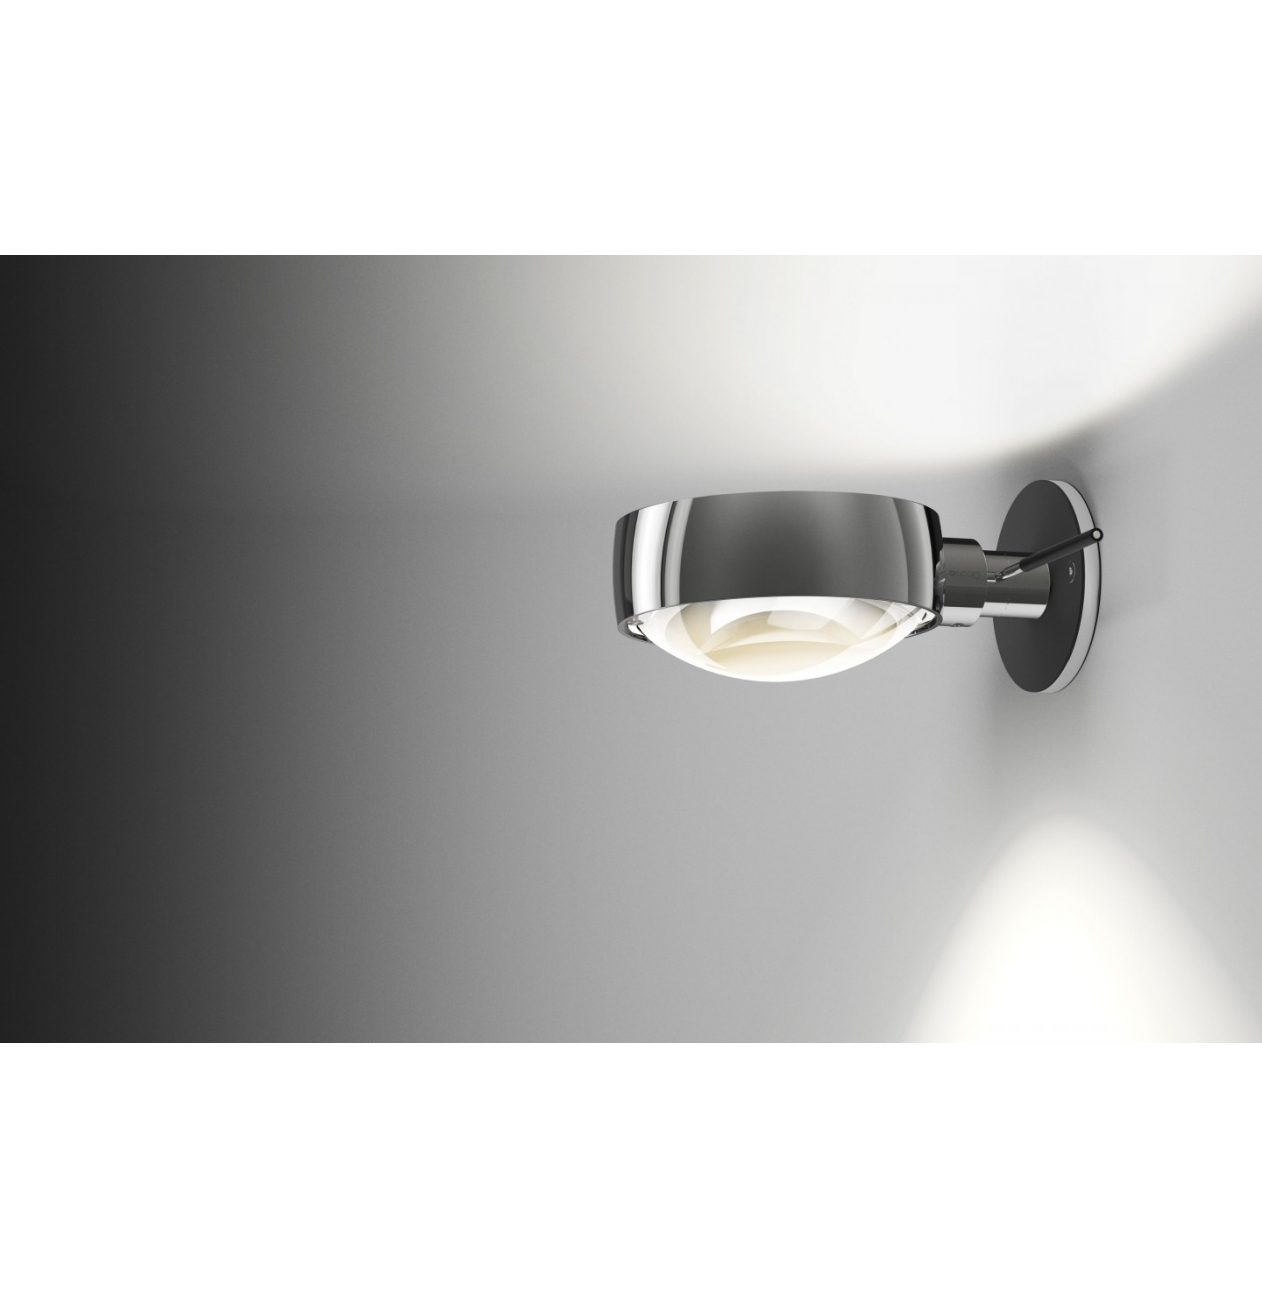 occhio wandlamp verticale sento e met extra mat glas. Black Bedroom Furniture Sets. Home Design Ideas